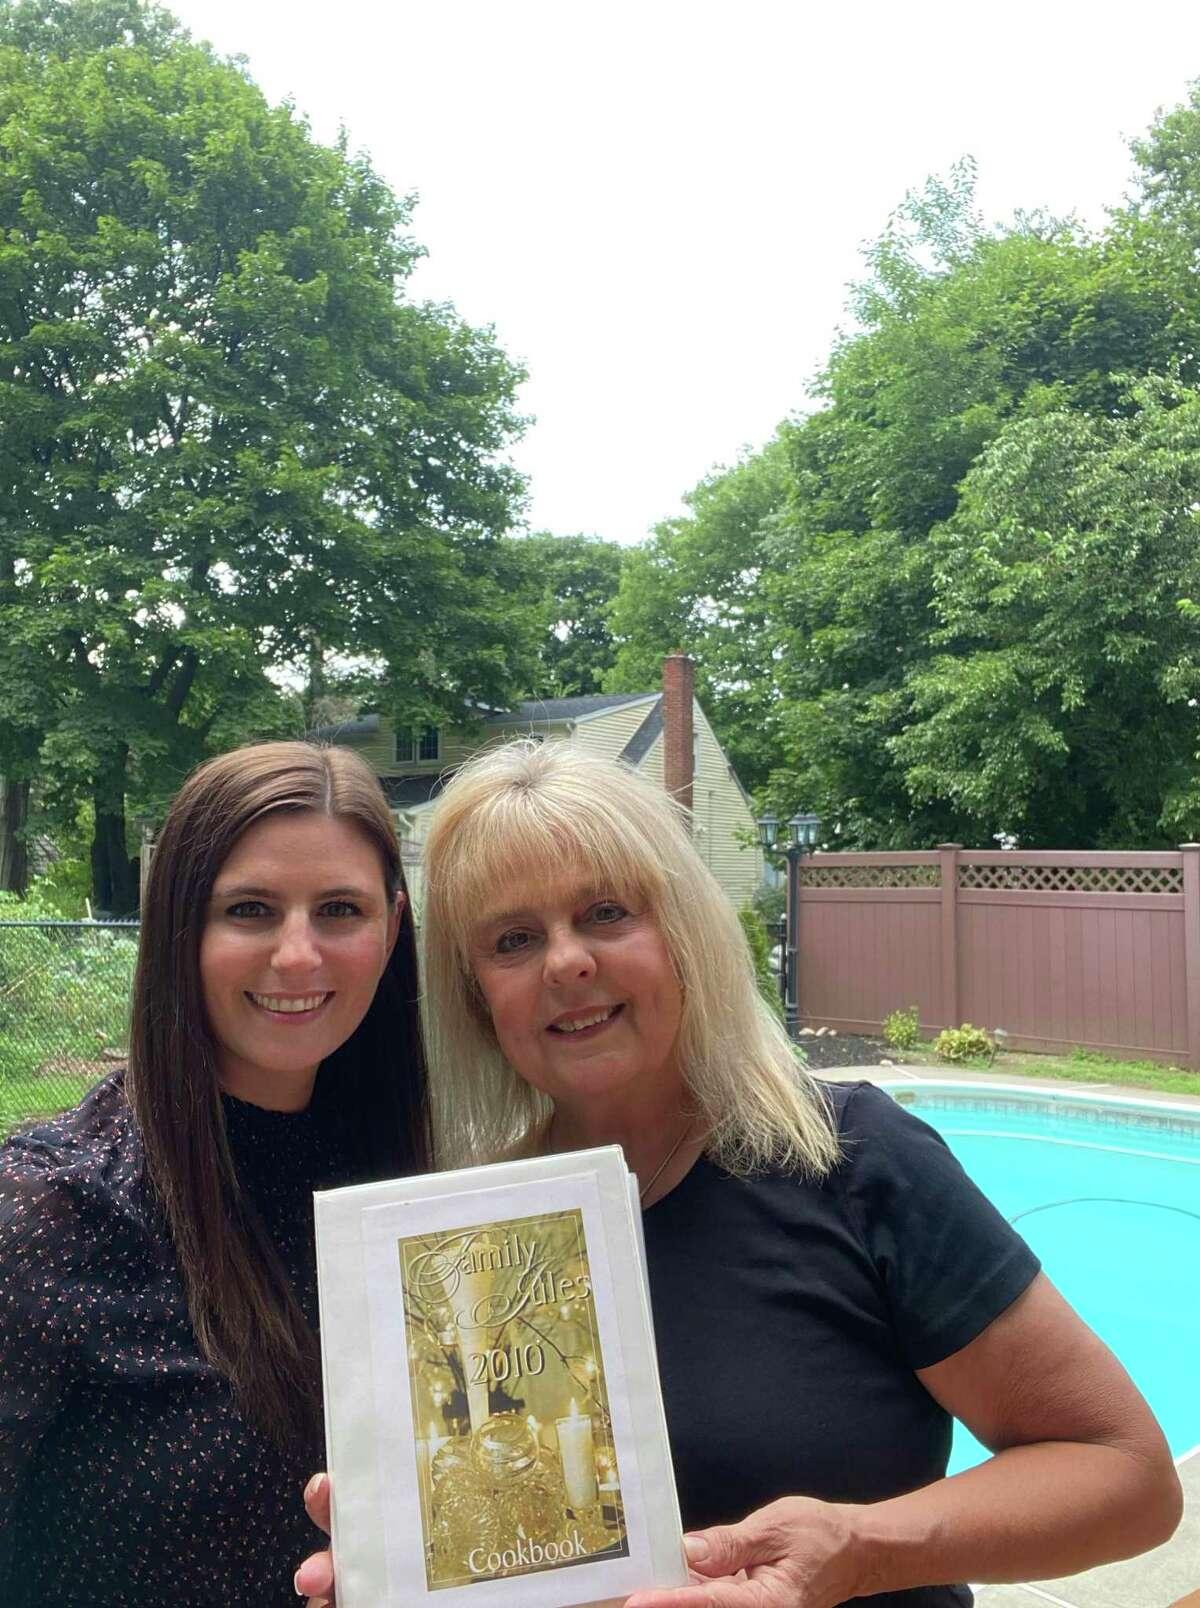 Julie Miller and her daughter Jordan pose with a copy of